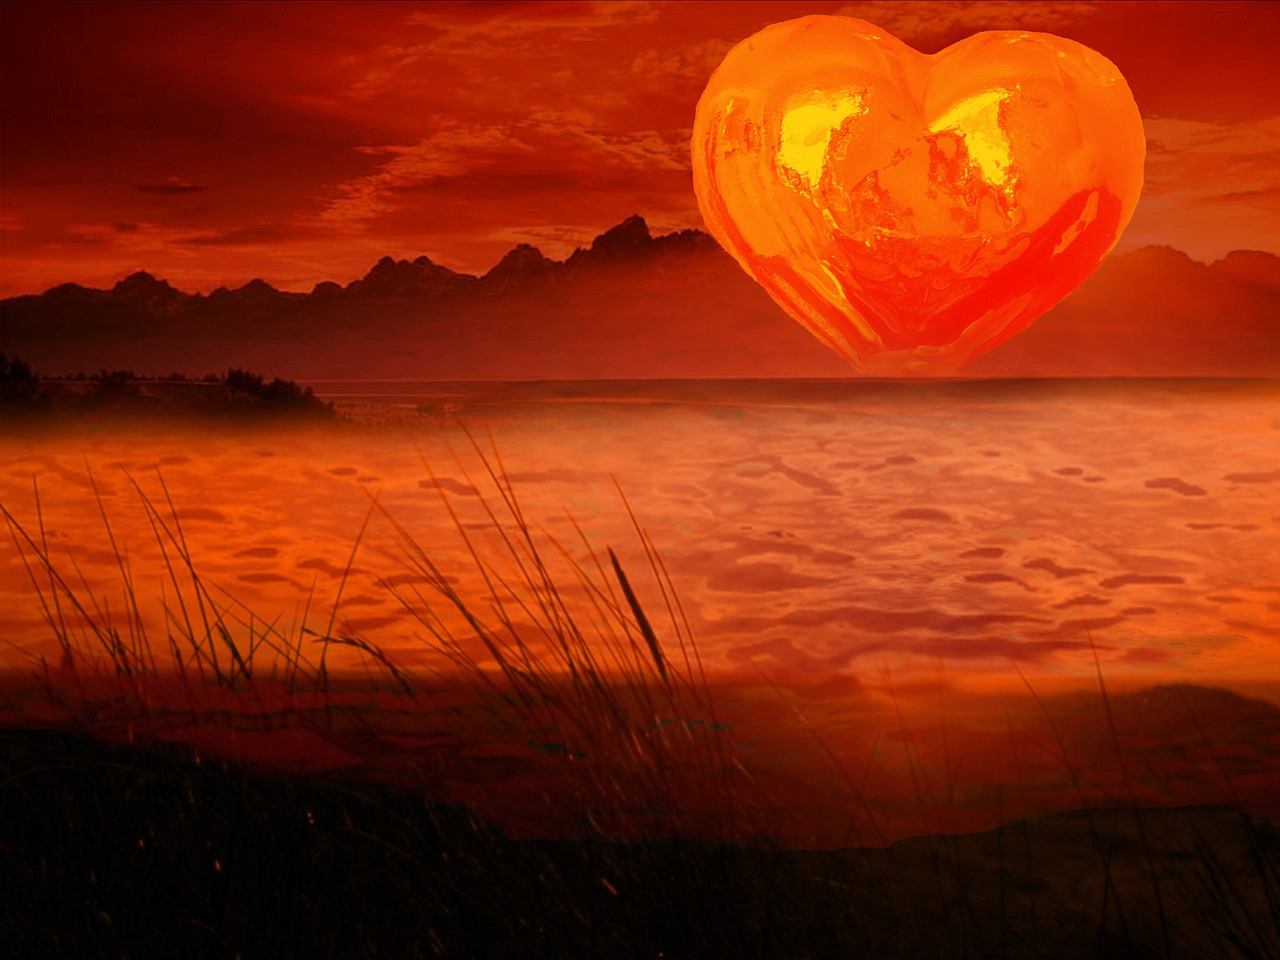 картинки солнечное сердце одну свечу